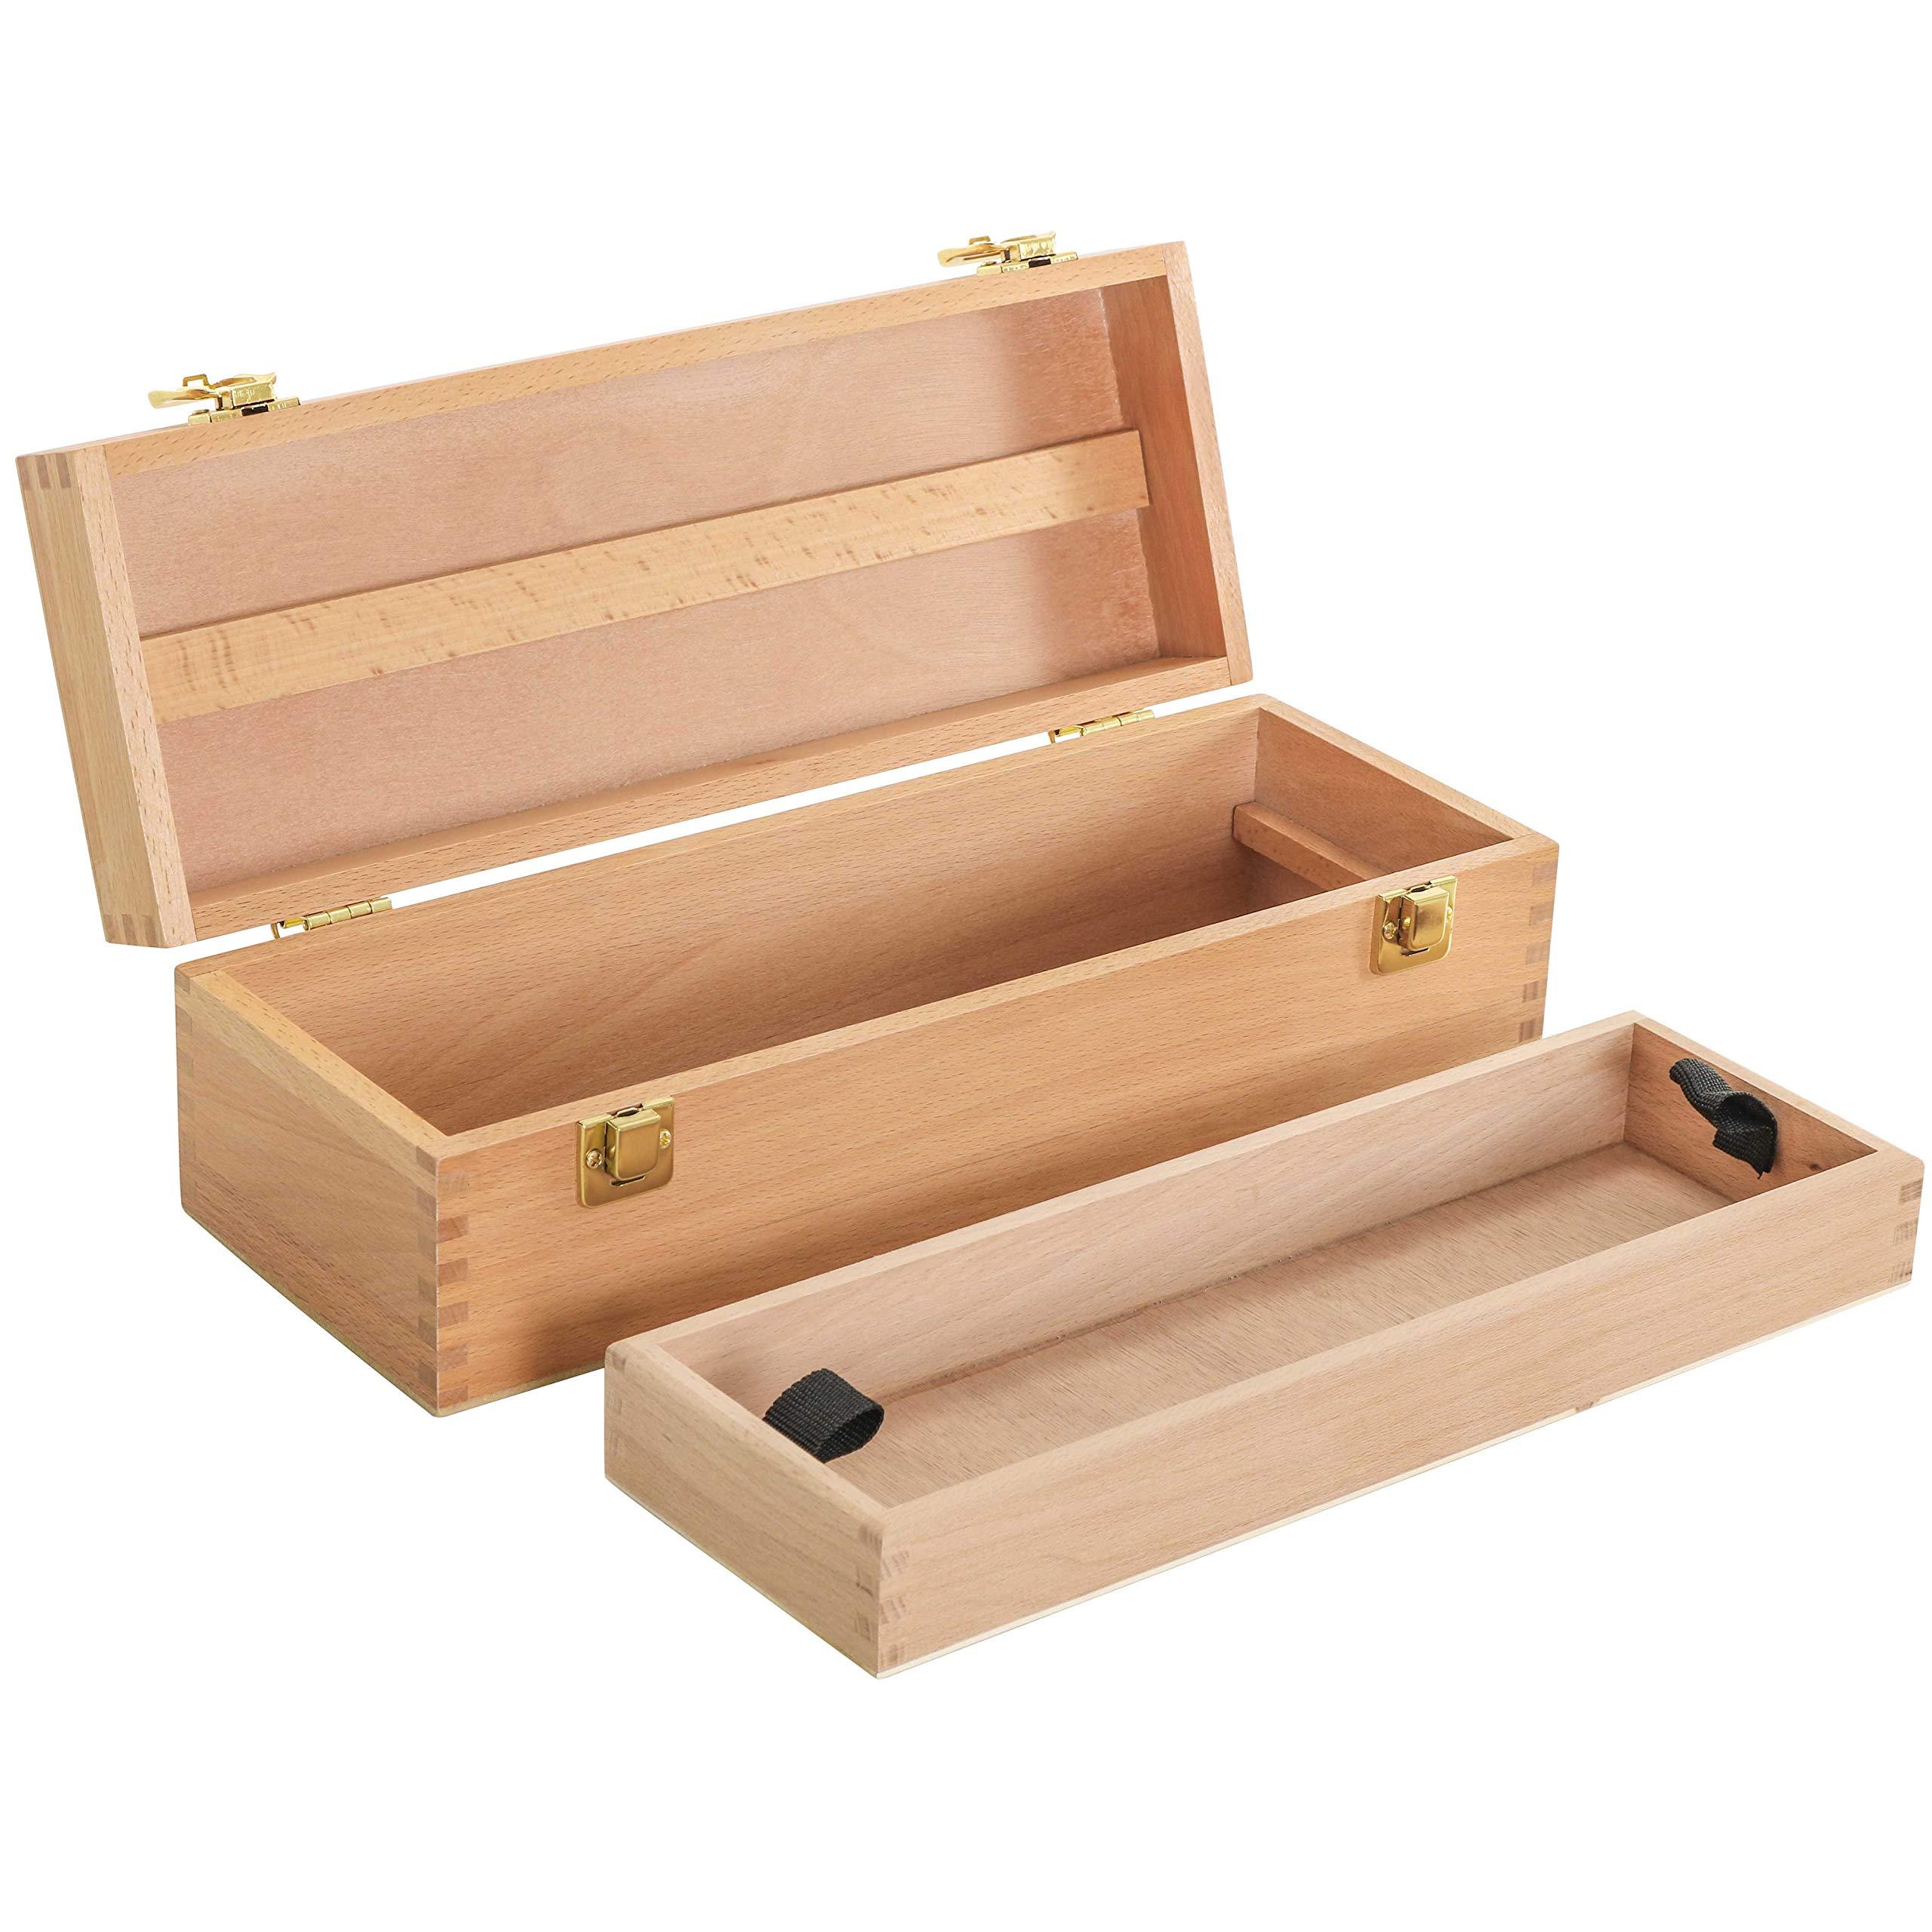 US Art Supply Artist Wood Pastel, Pen, Marker Storage Box with Drawer(s) (Medium Tool Box)